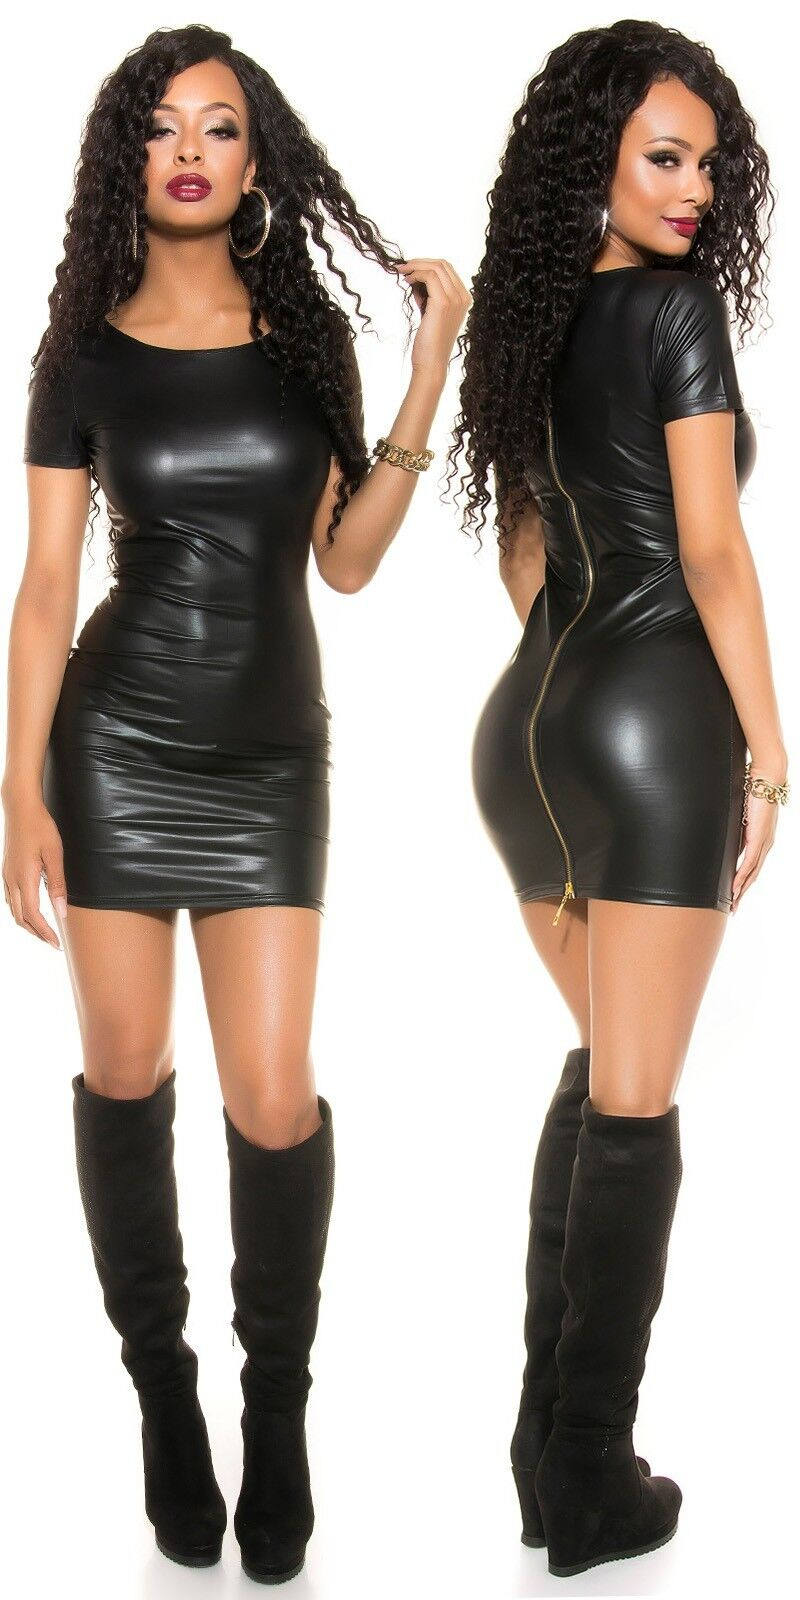 Sexy Wetlook Minikleid Reißverschluss Zip Kurzarm S M 36 38 black Mini Kleid